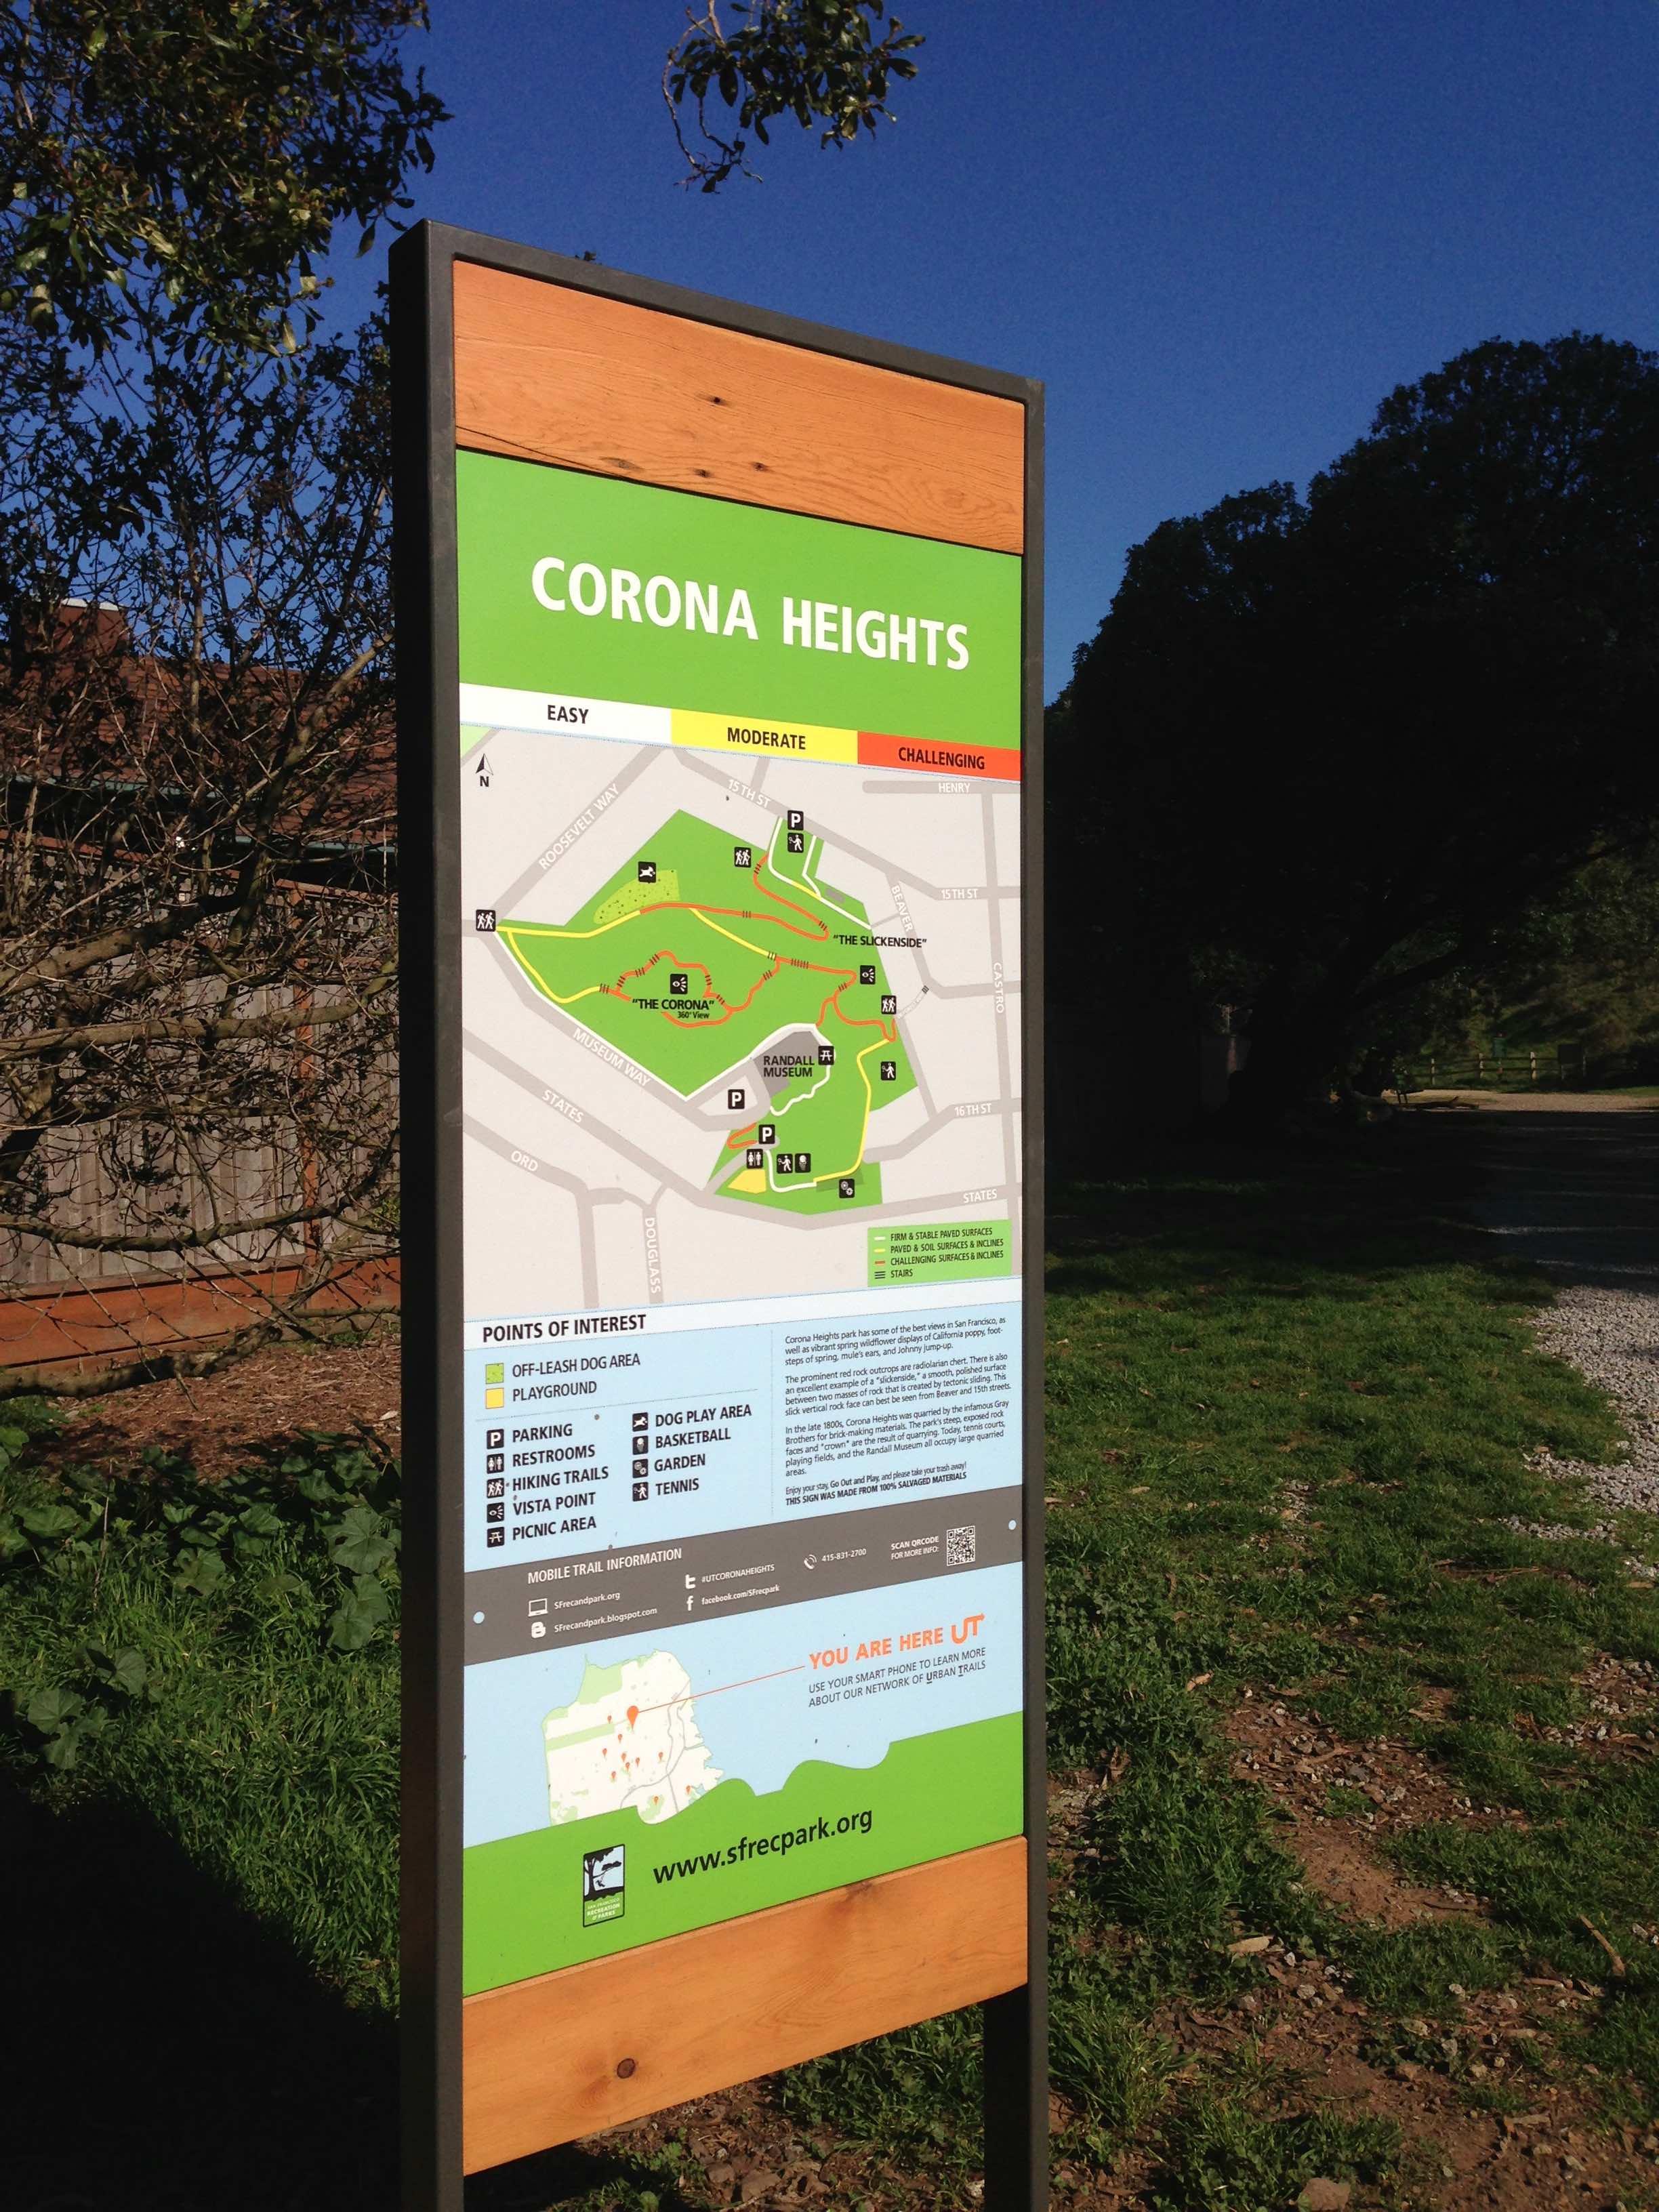 InkeDesign-SFRPD-Signage-Corona-Heights1.jpg